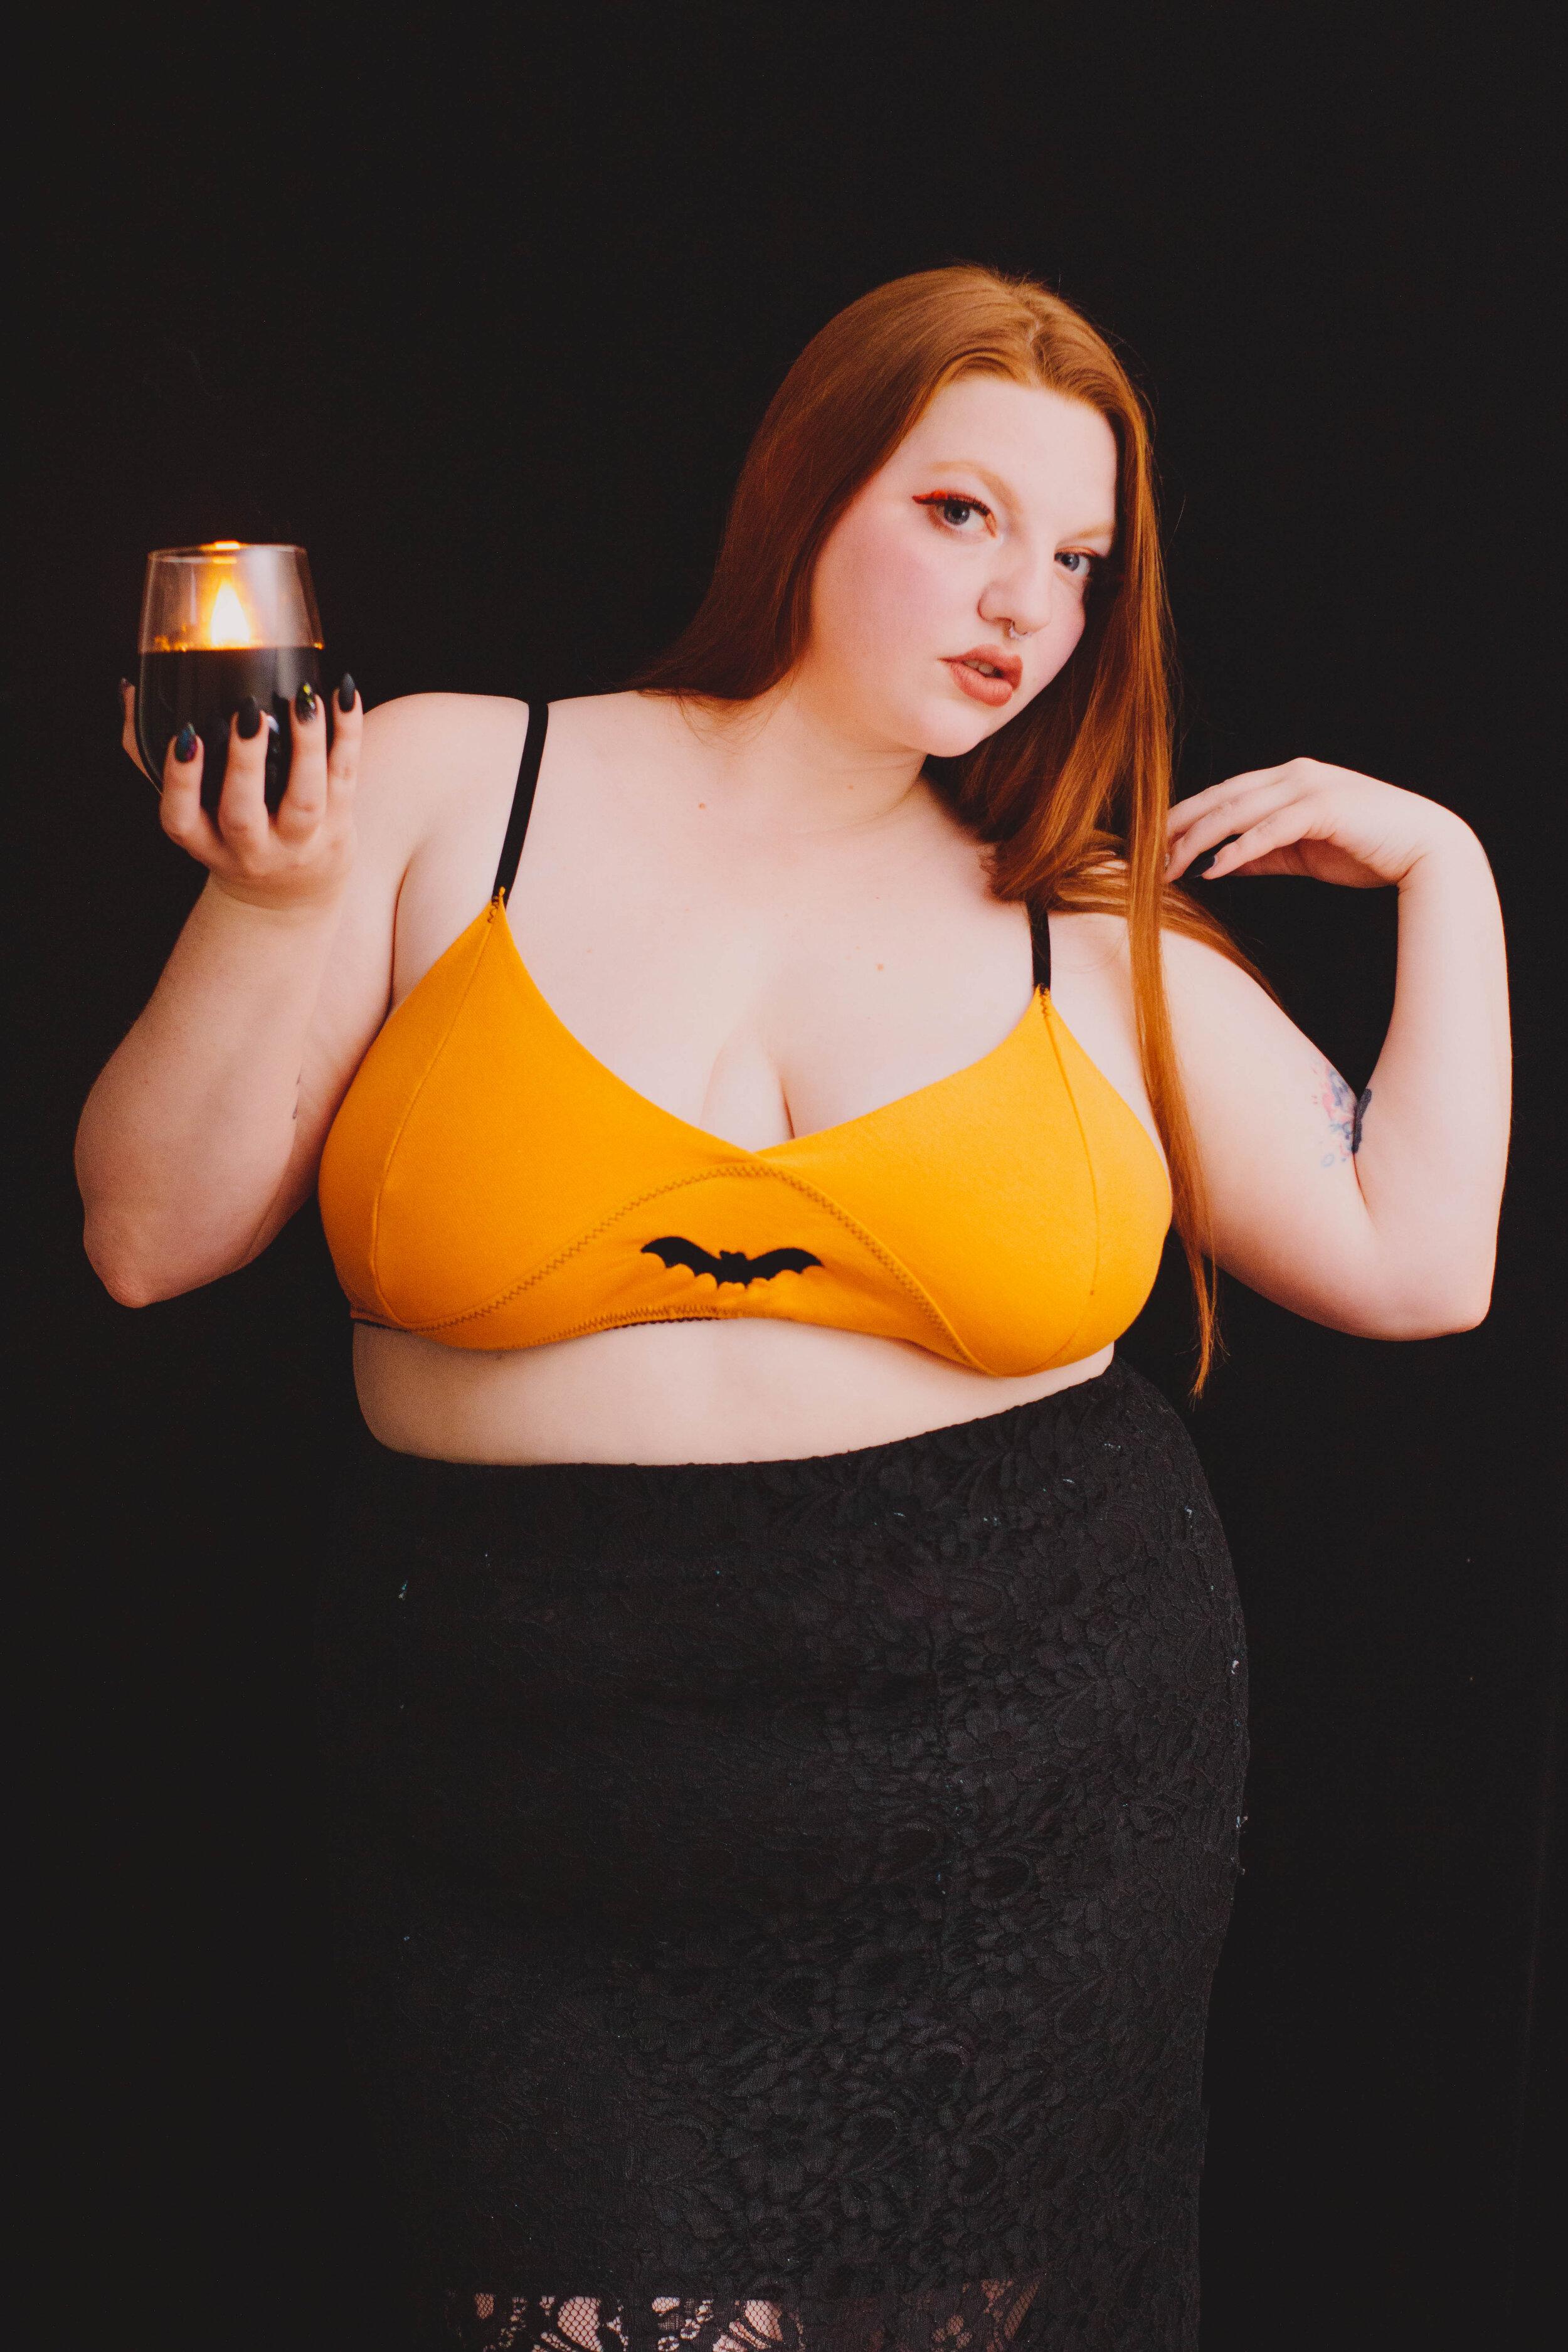 Soapbox-Halloween-Peach Girl Photo-3935-2.jpg